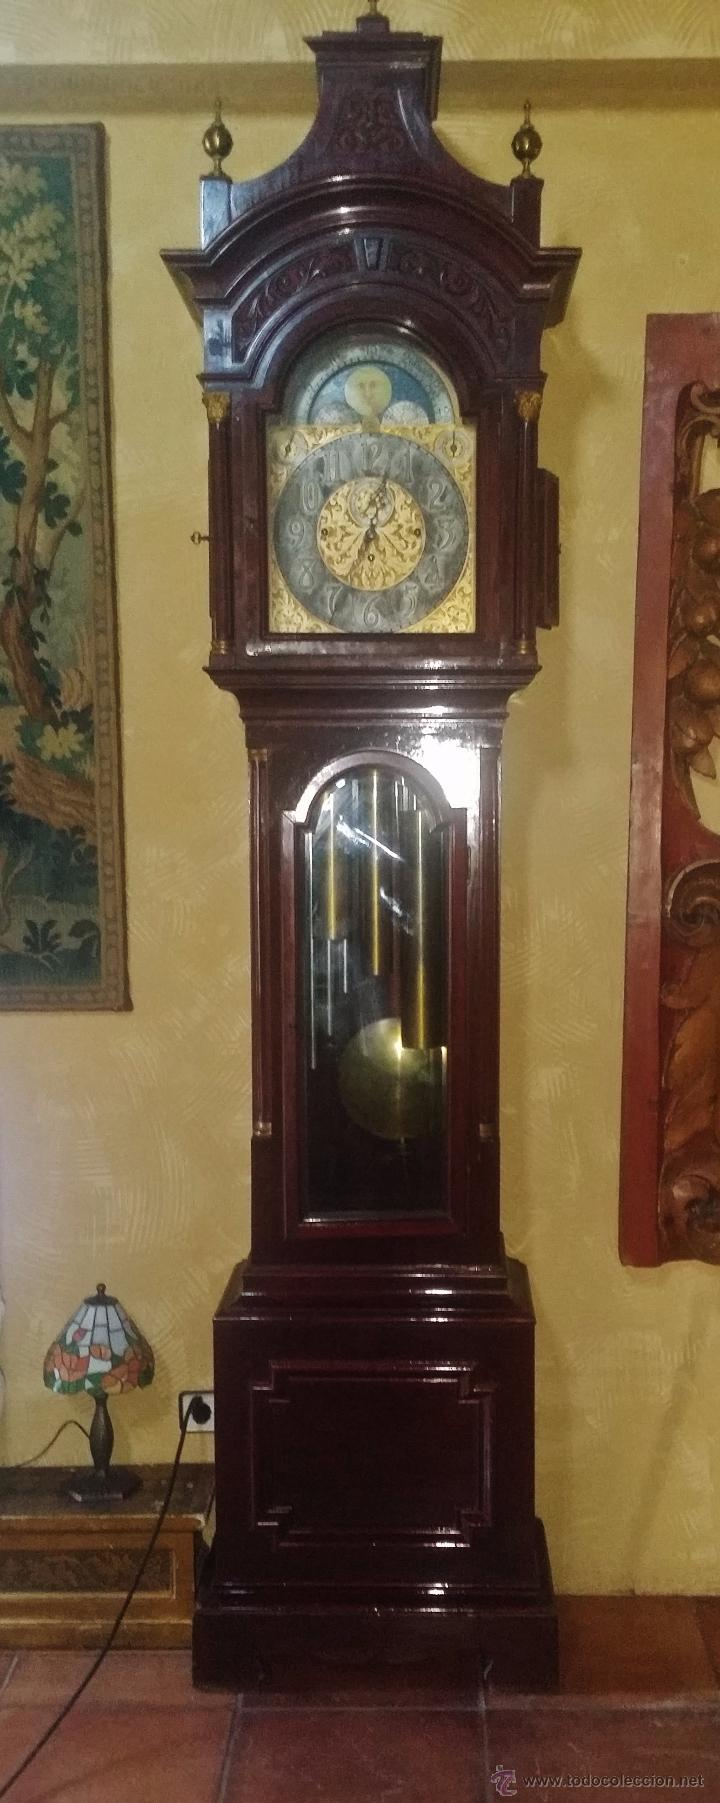 Relojes de pie: RELOJ DE PIE Grandfather ALEMAN,FASES LUNARES DOBLE SONERIA CARILLON,LORENZ FURTWÄNGLER UND SOHNE - Foto 32 - 51741820